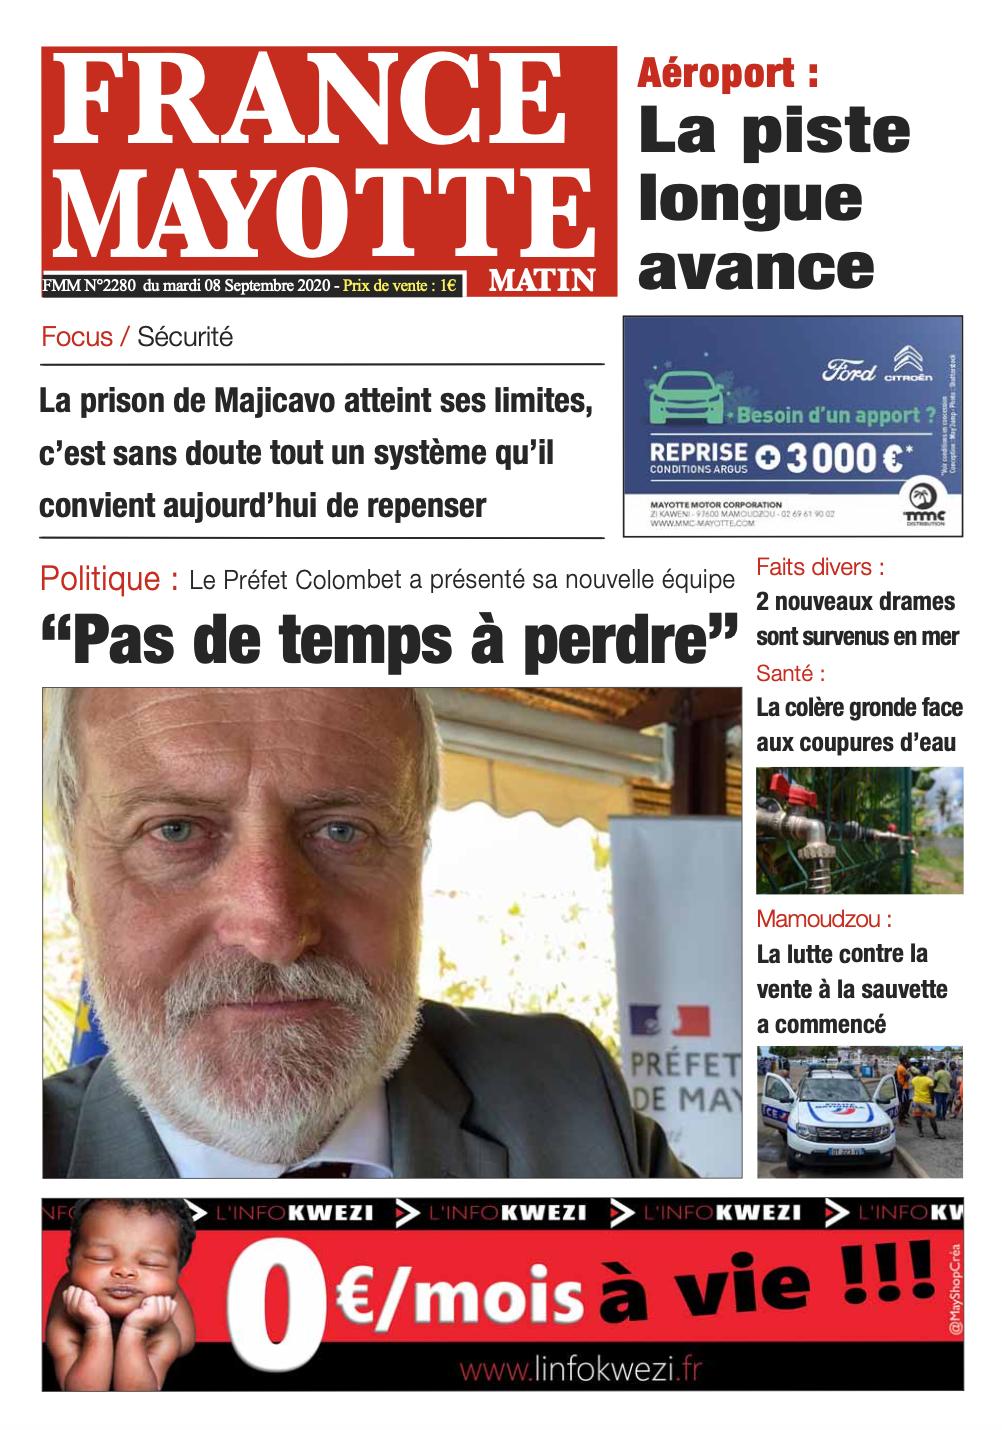 France Mayotte Mardi 8 septembre 2020